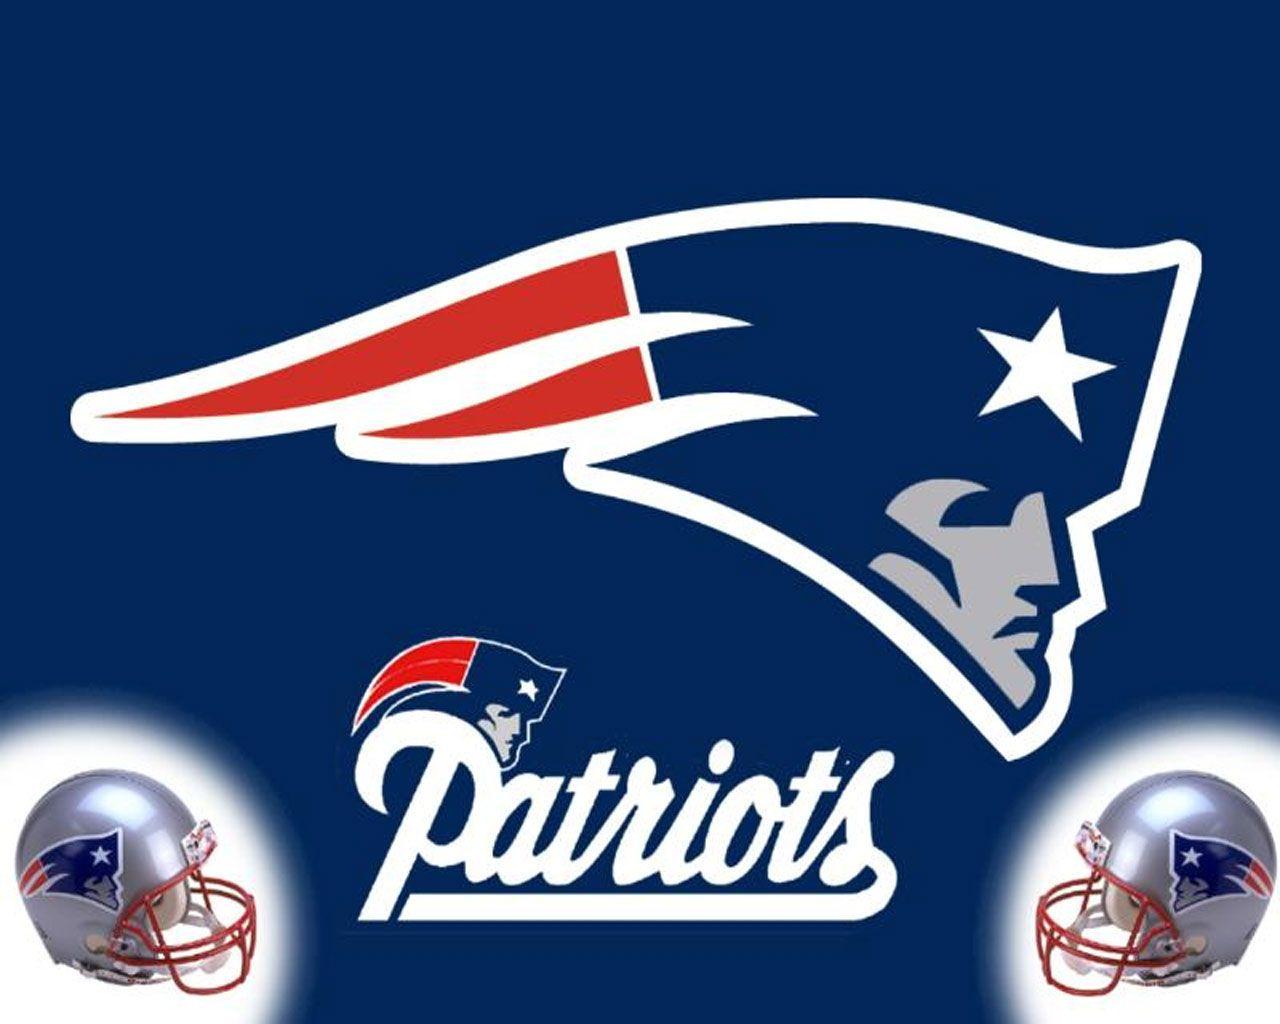 new england patriots team logo and helmet wallpaper 1280x1024 photo 1280x1024